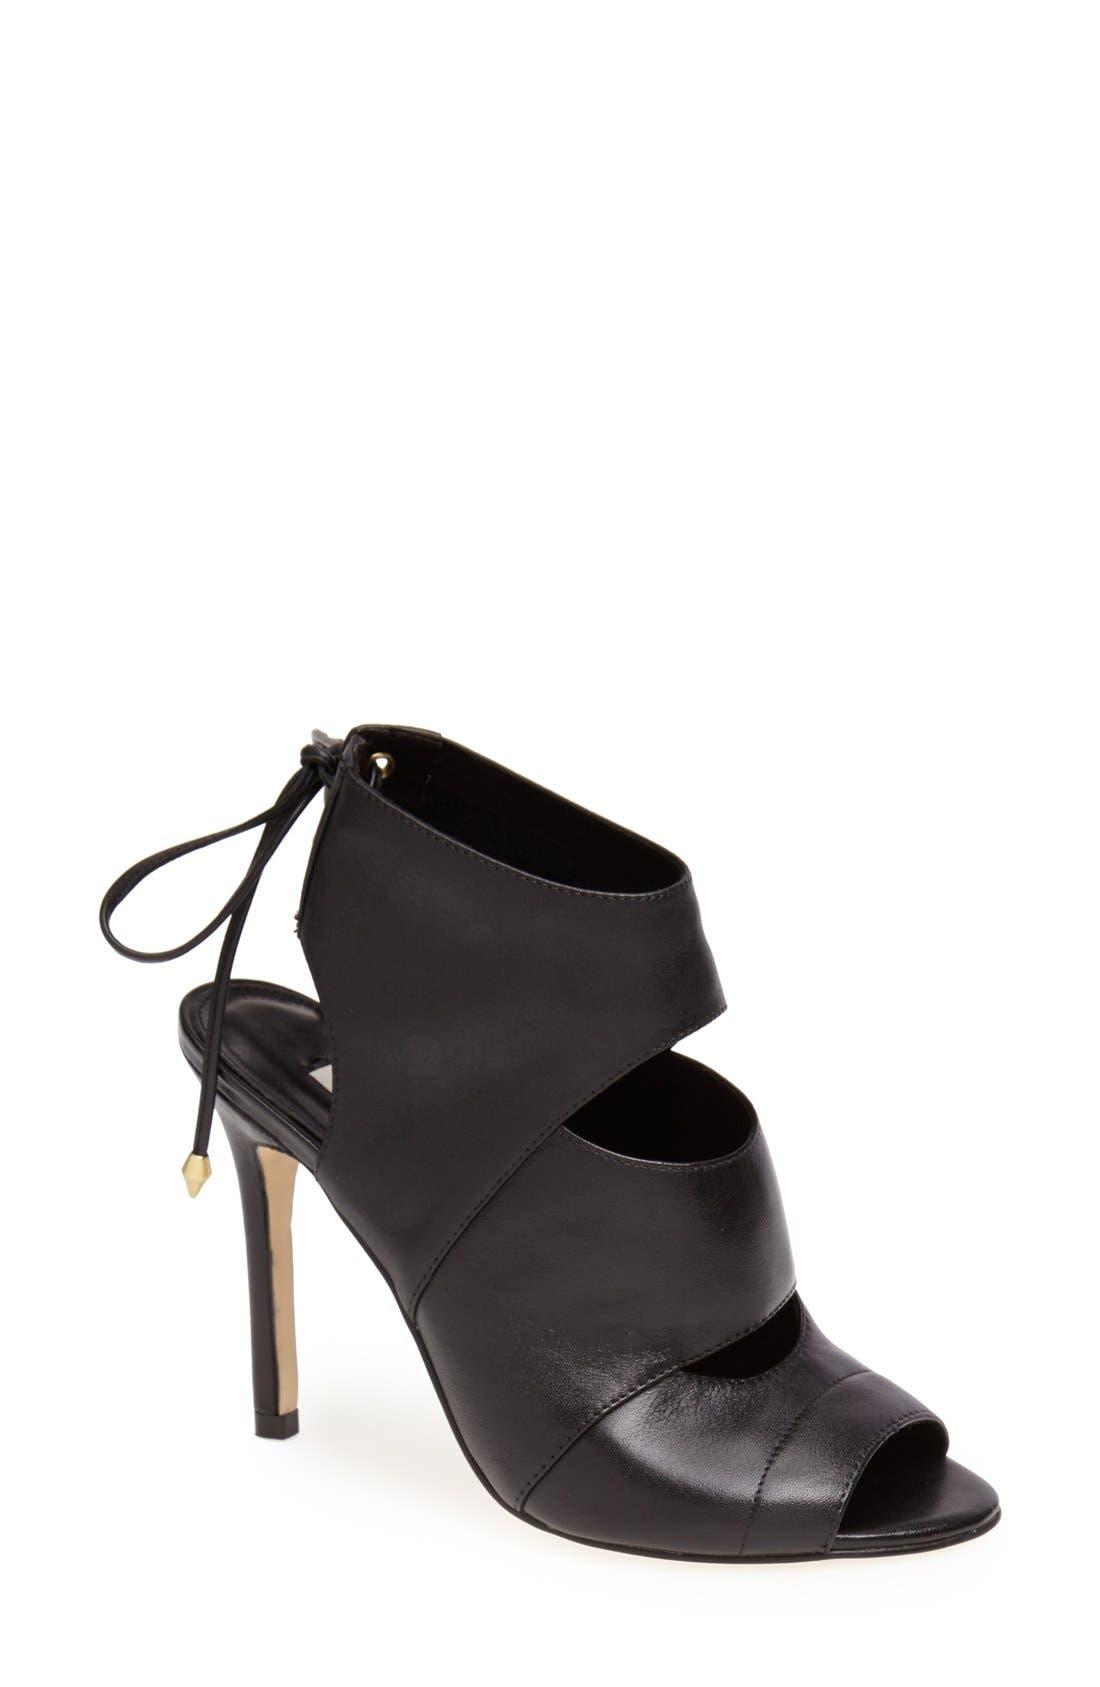 Main Image - GUESS 'Ollay' Sandal (Women)